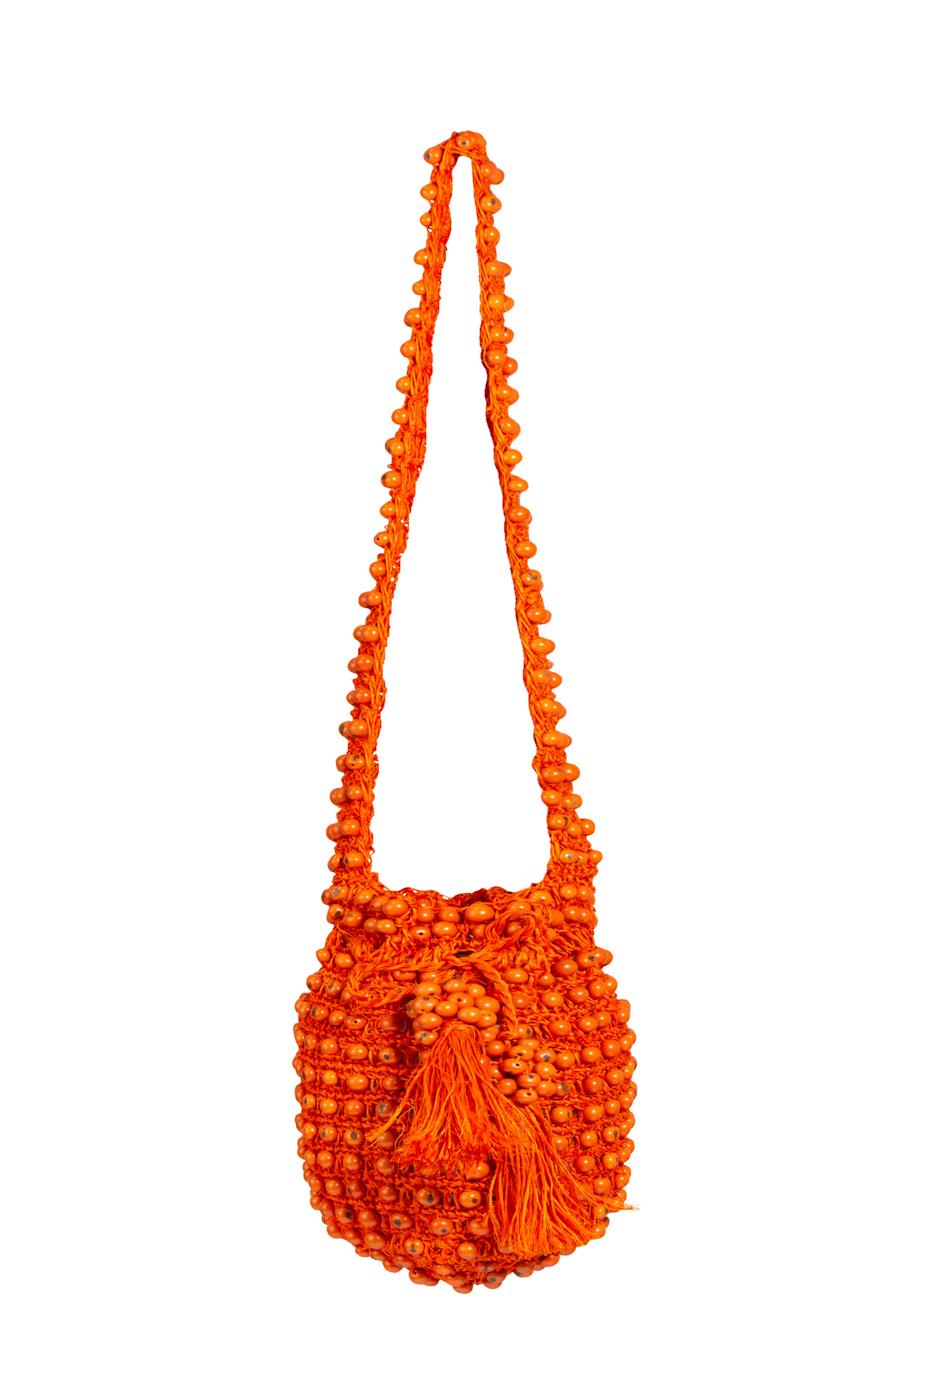 Mochila fique tagua naranja